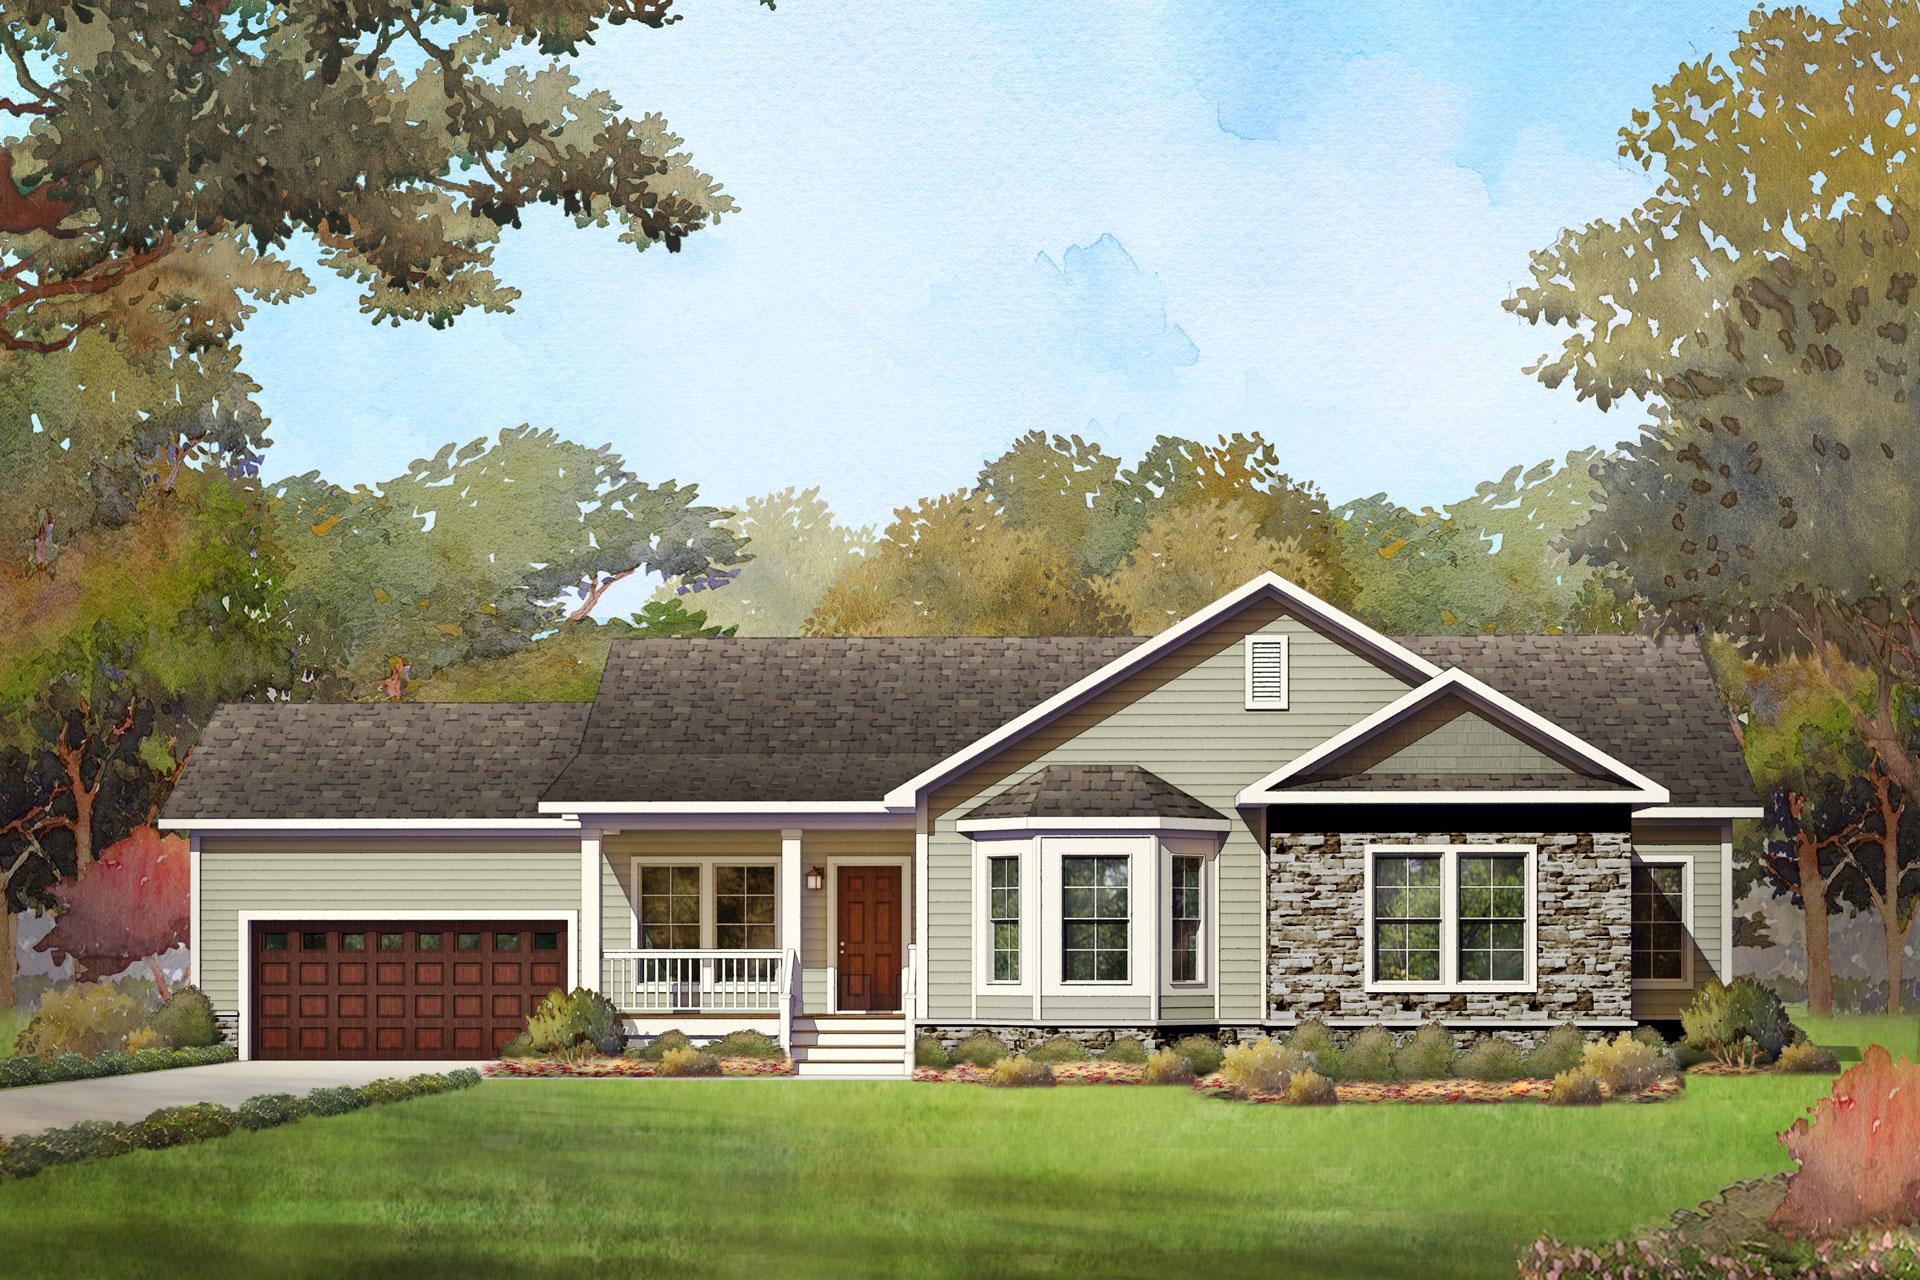 chapel lake modular home rendering